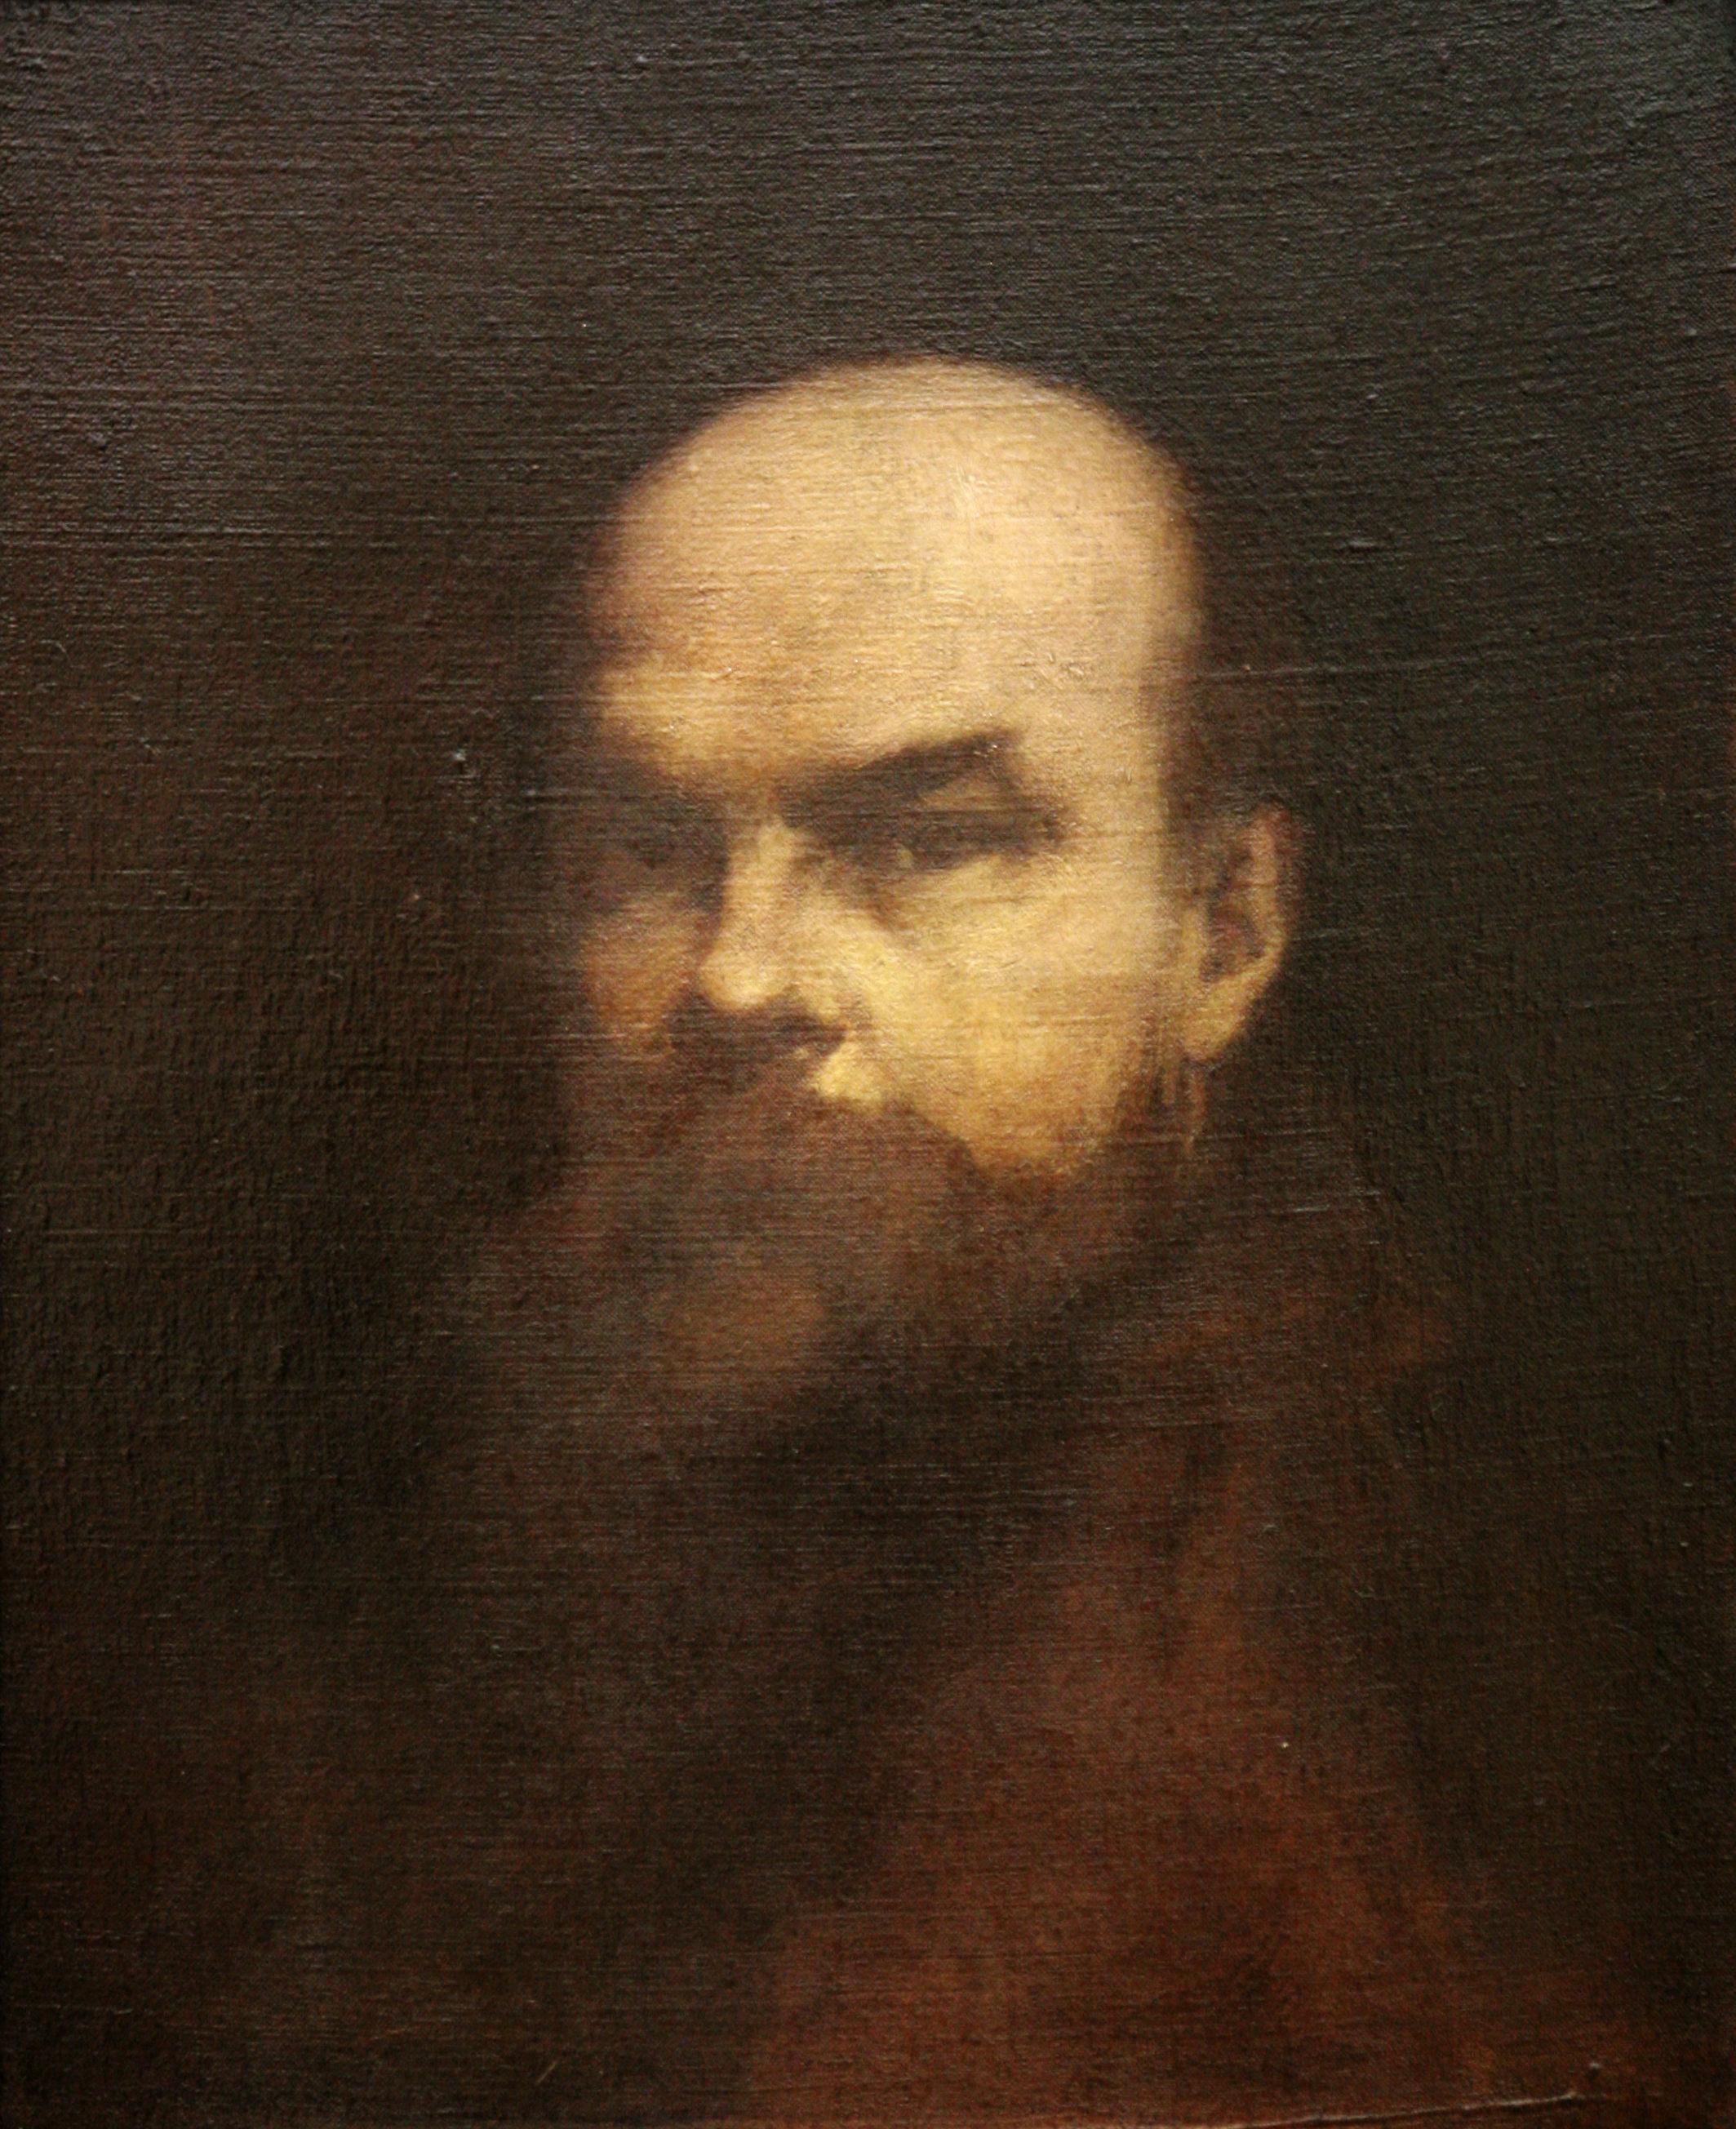 http://upload.wikimedia.org/wikipedia/commons/4/40/Paul_Verlaine-Edouard_Chantalat_mg_9502.jpg